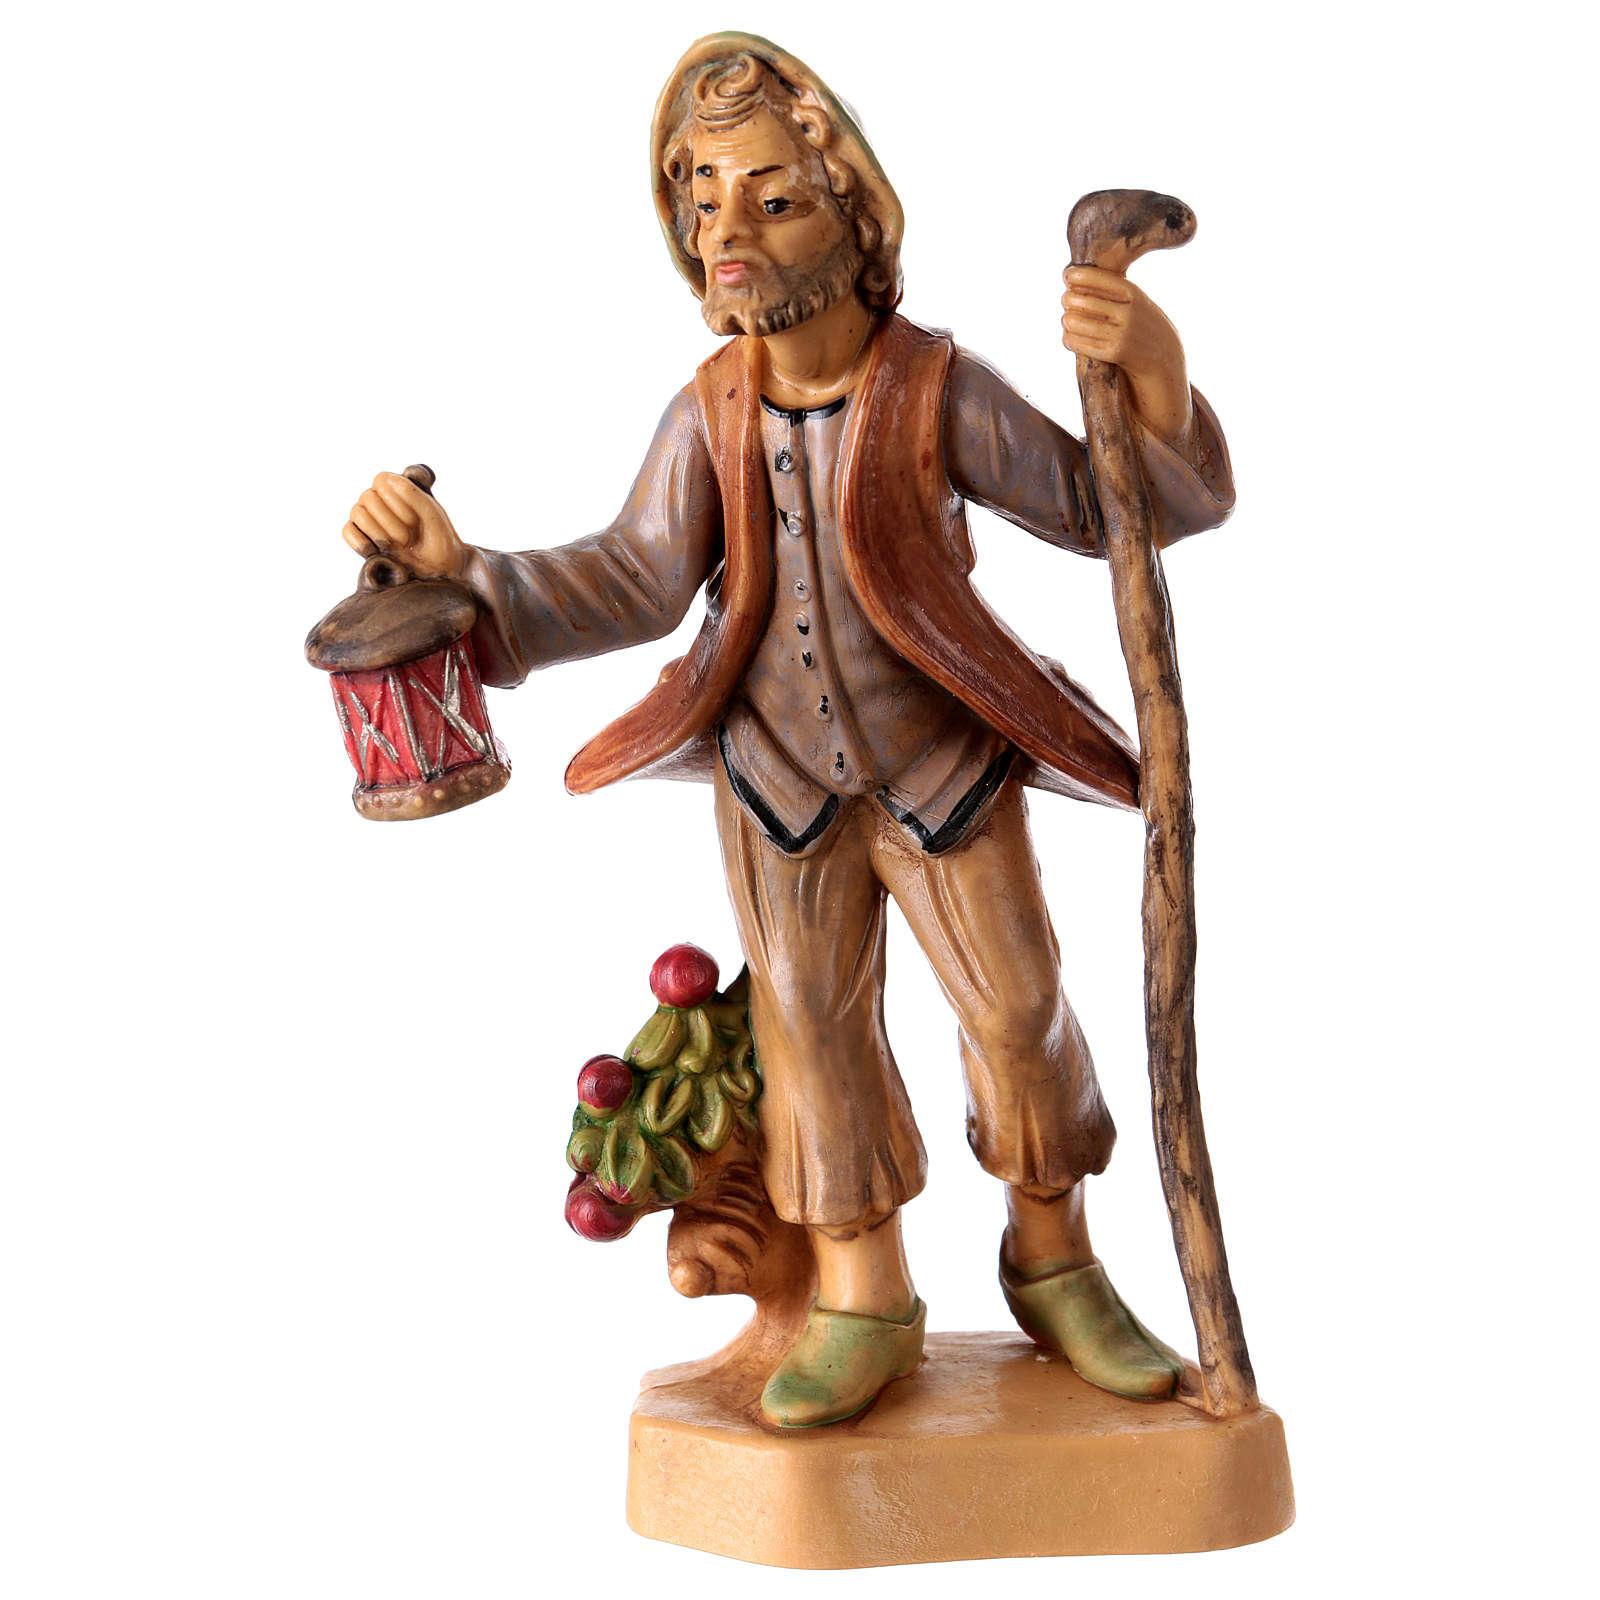 Hombre con linterna 12 cm de altura media para belén 3